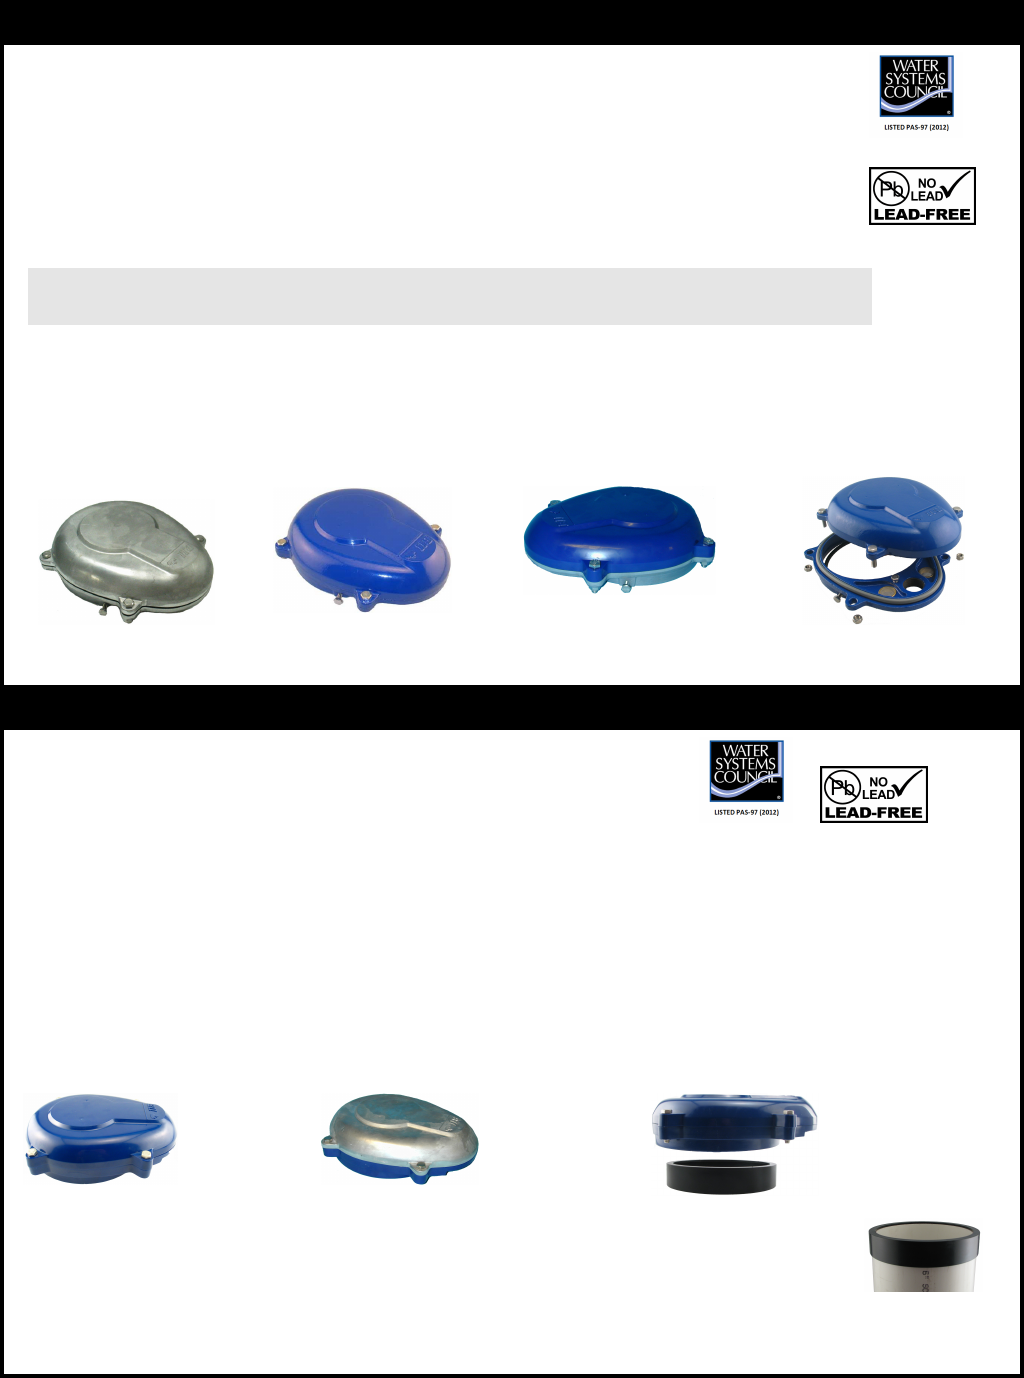 536566 1 Boshart Wtc Series Brochure PITLESS ADAPTERS, WELL CAPS